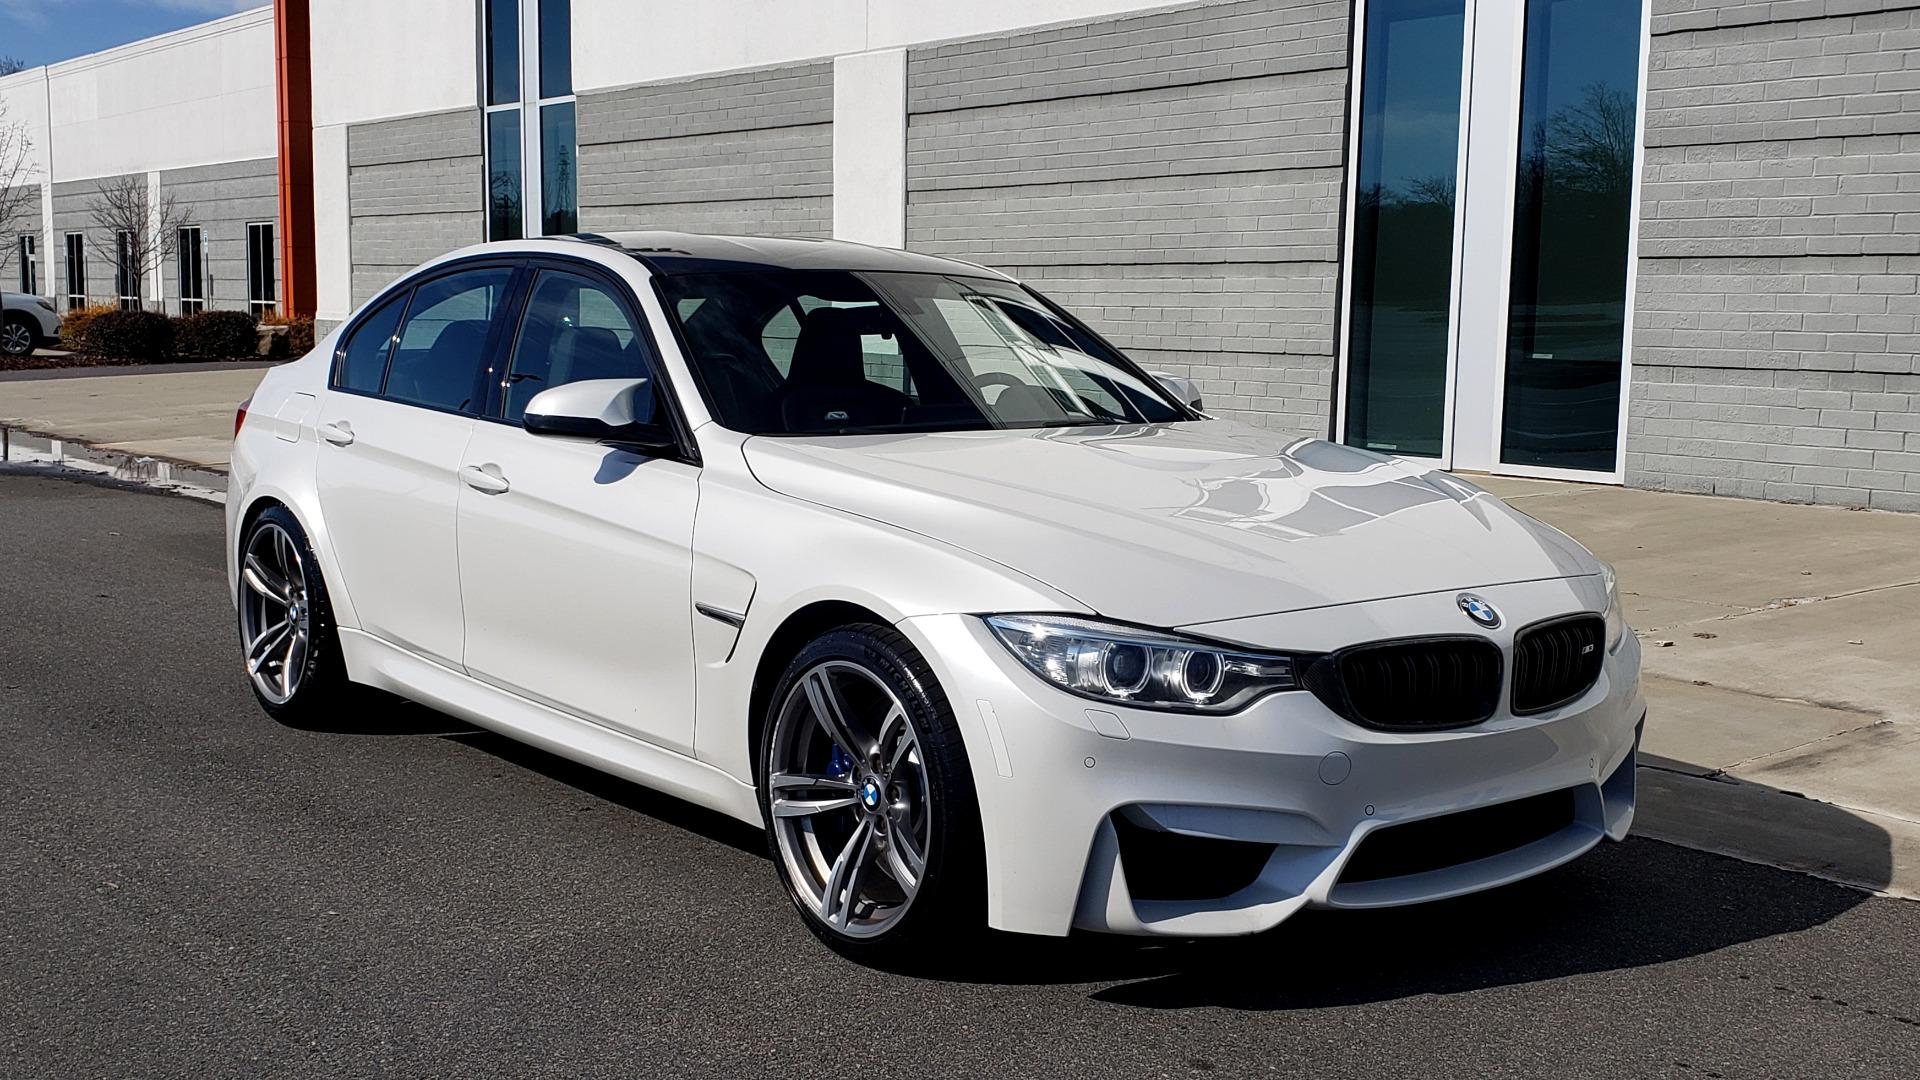 Used 2016 BMW M3 SEDAN / EXECUTIVE PKG / M-SUSPENSION / HARMAN/KARDON SOUND for sale Sold at Formula Imports in Charlotte NC 28227 15